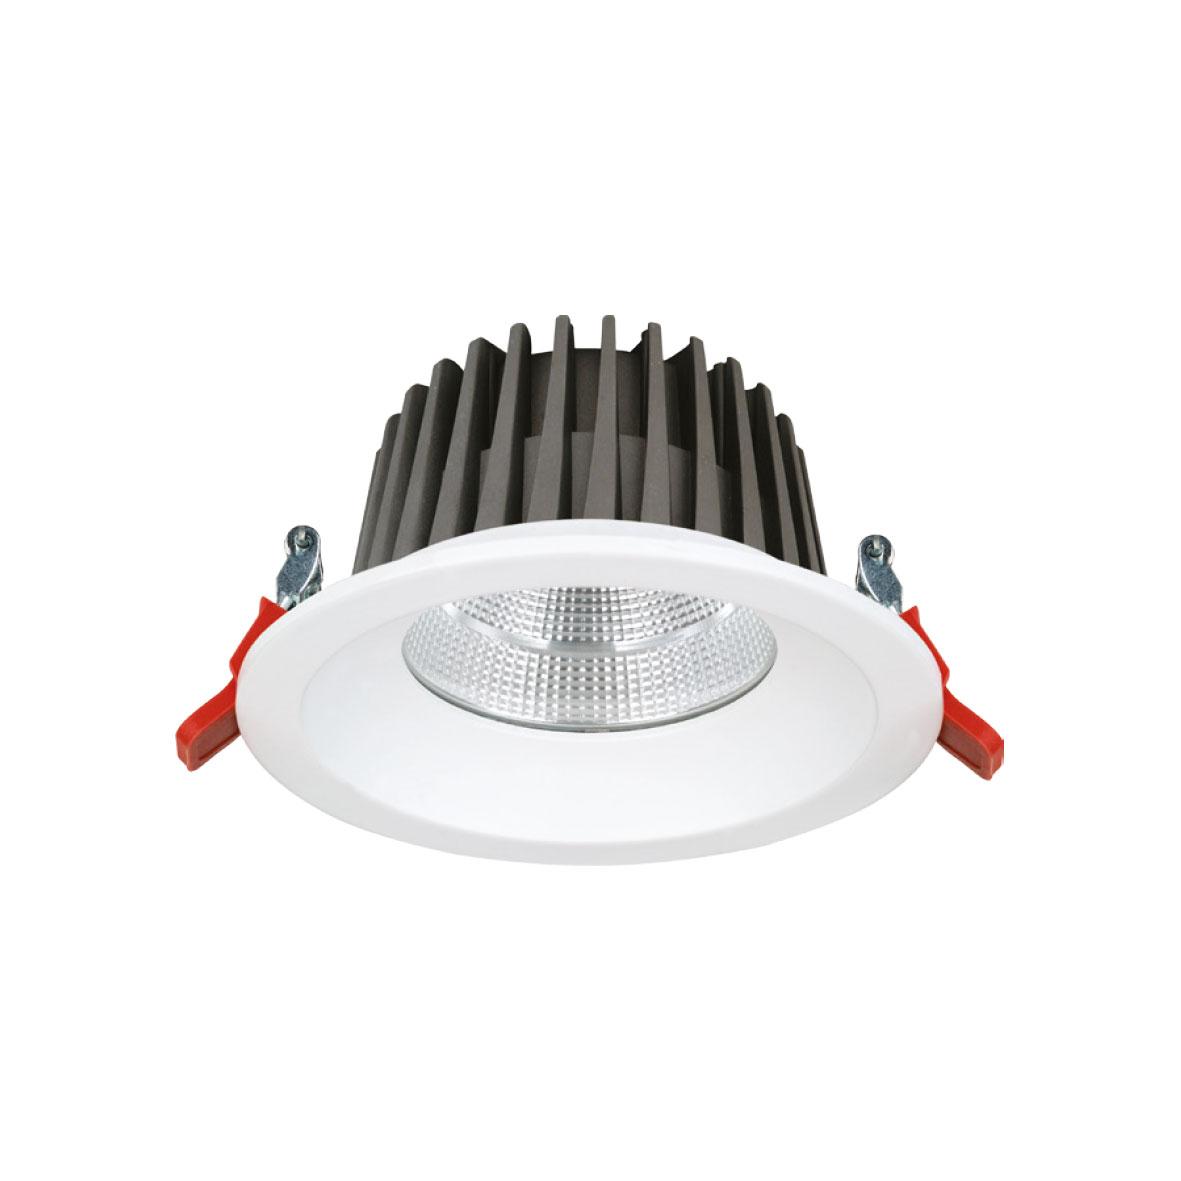 چراغ سقفی توکار SH-4029-15W